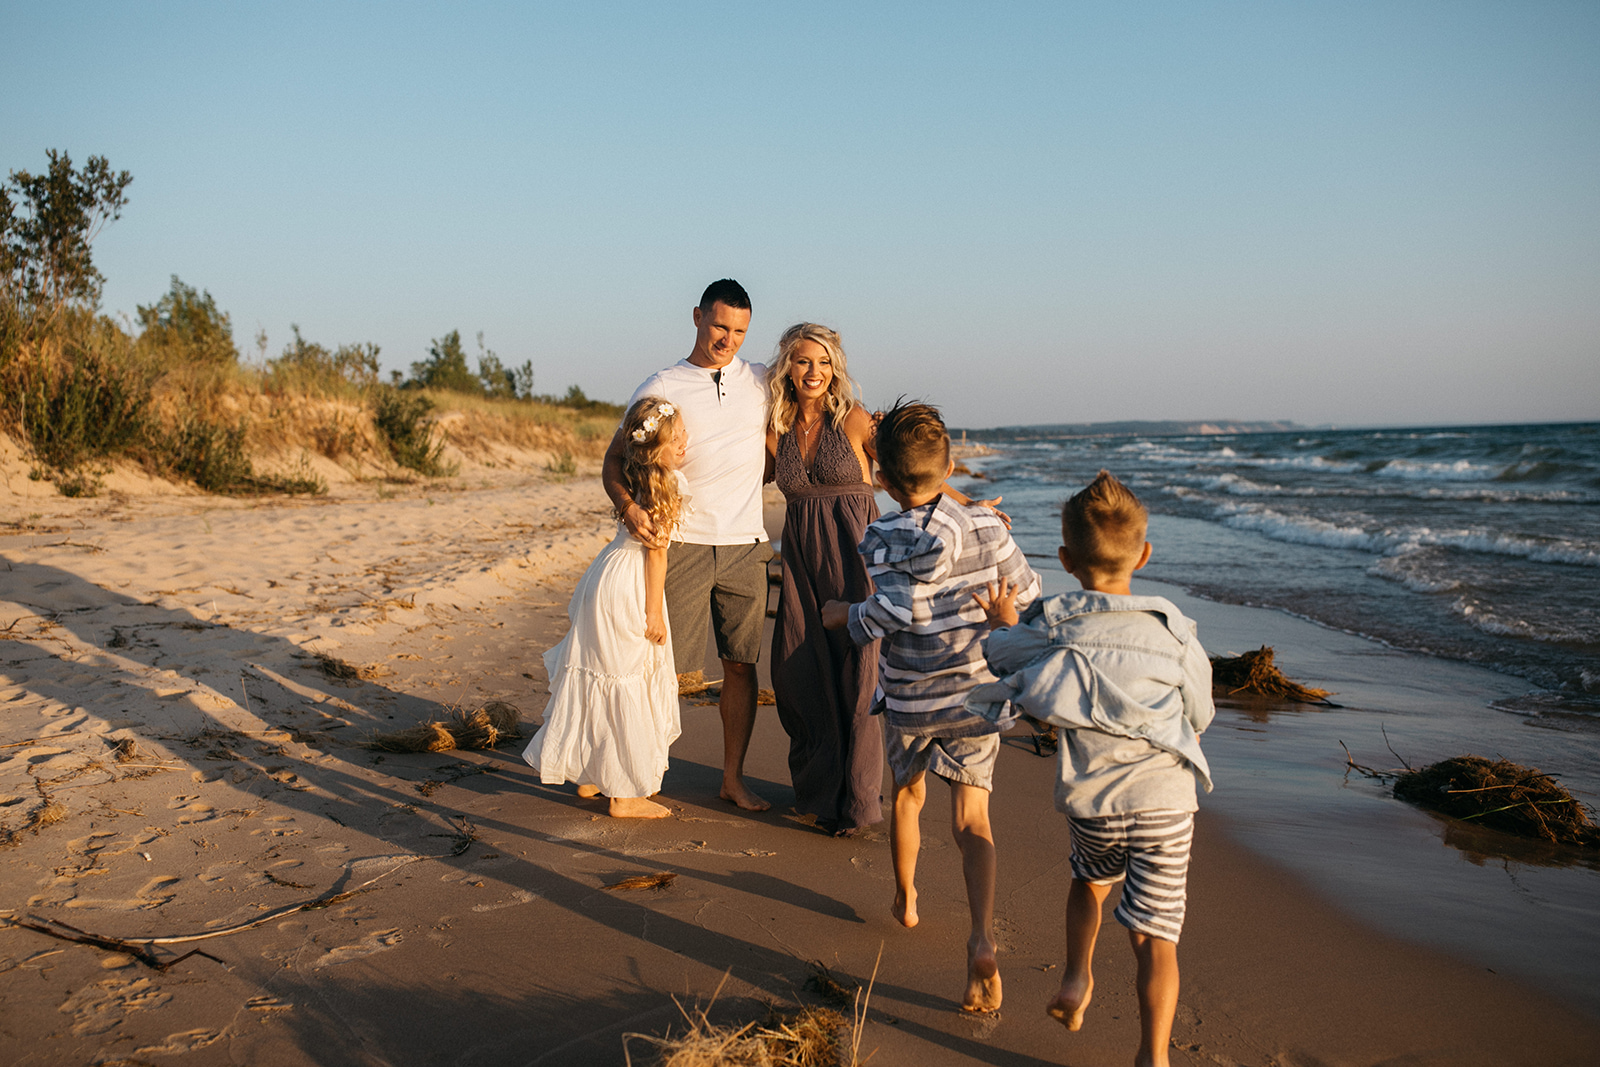 michigan-storytelling-photographer-ludington-mi-state-park-andrews-family-sunset-session-132.jpg